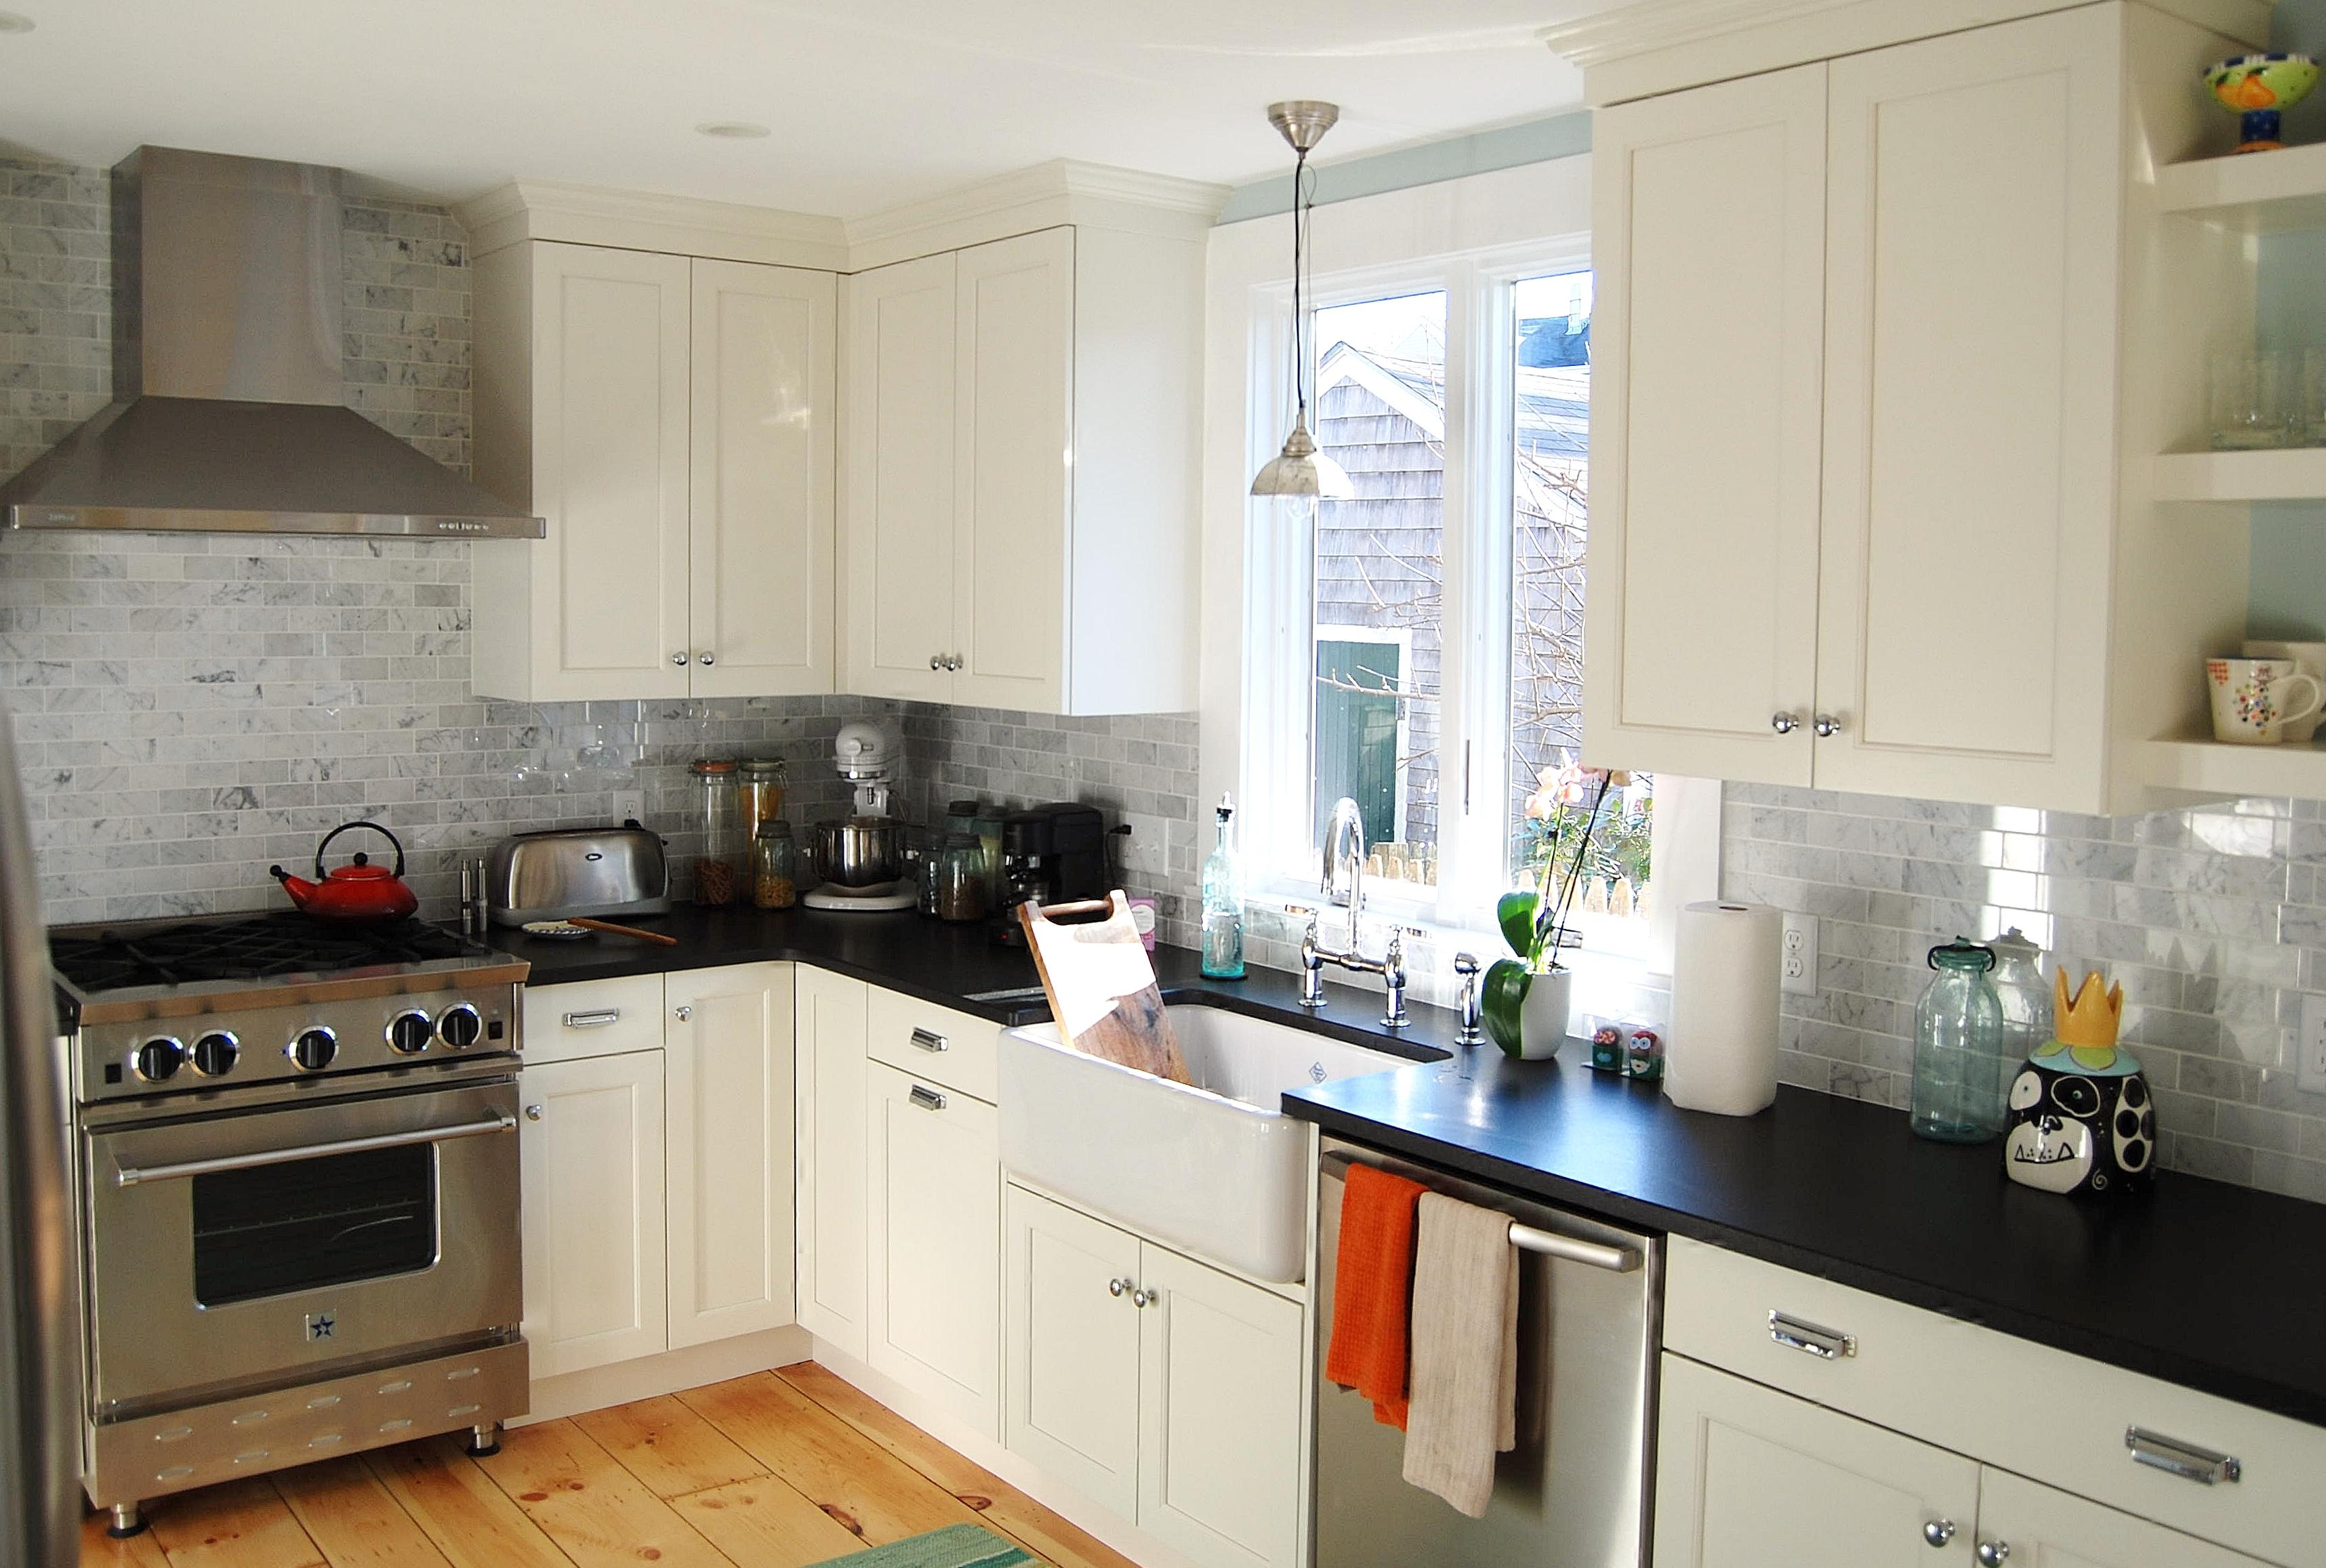 KRB Kitchen and Bath Design Center 257 Portsmouth Ave Stratham, NH ...